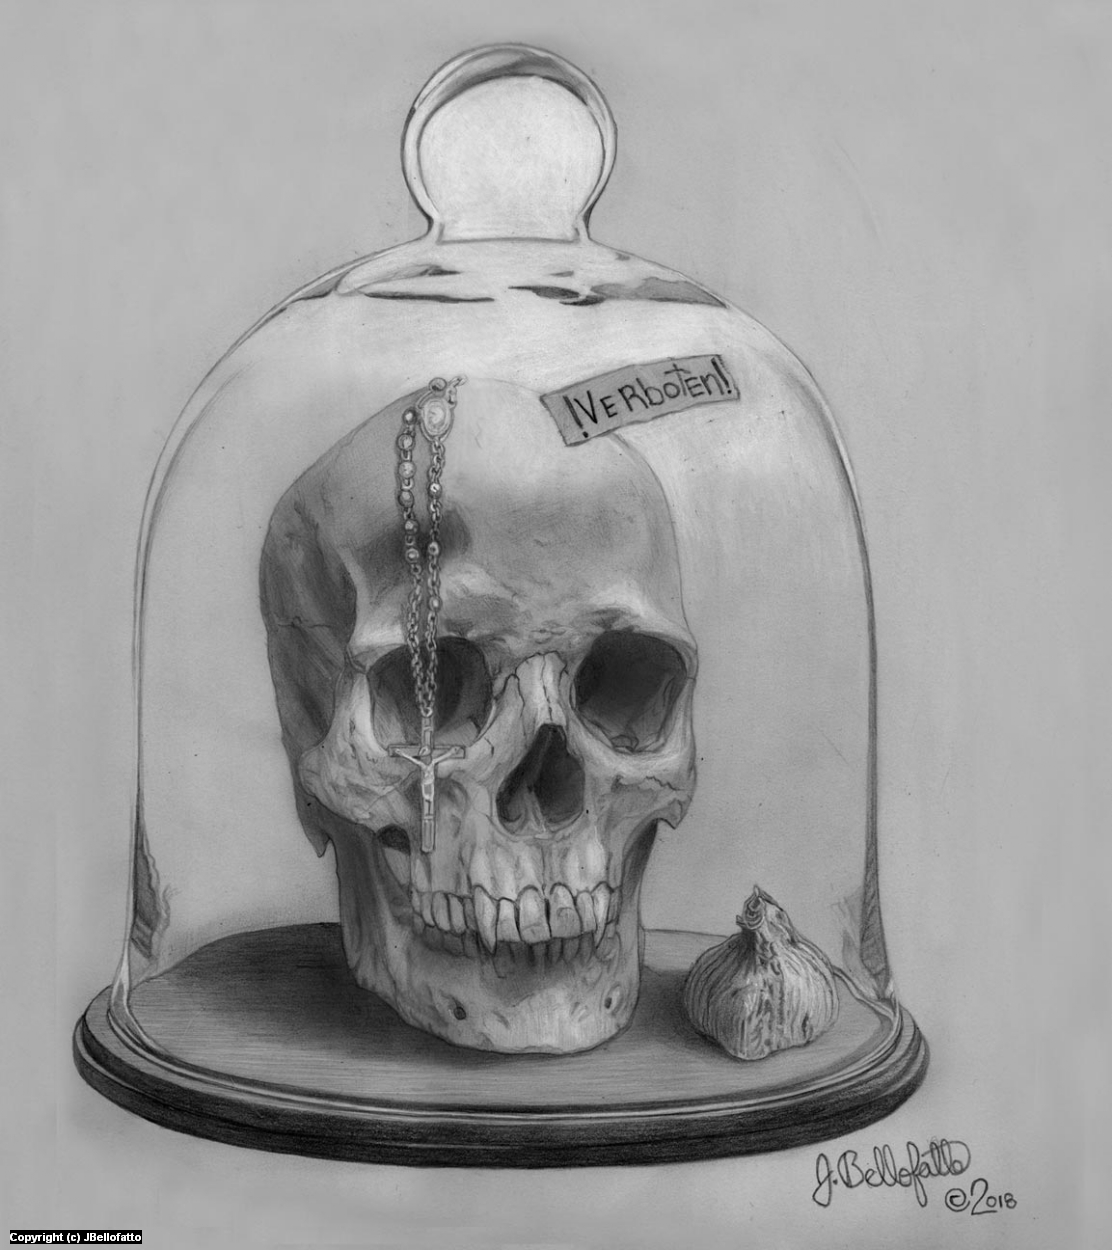 Verboten! Artwork by Joseph Bellofatto